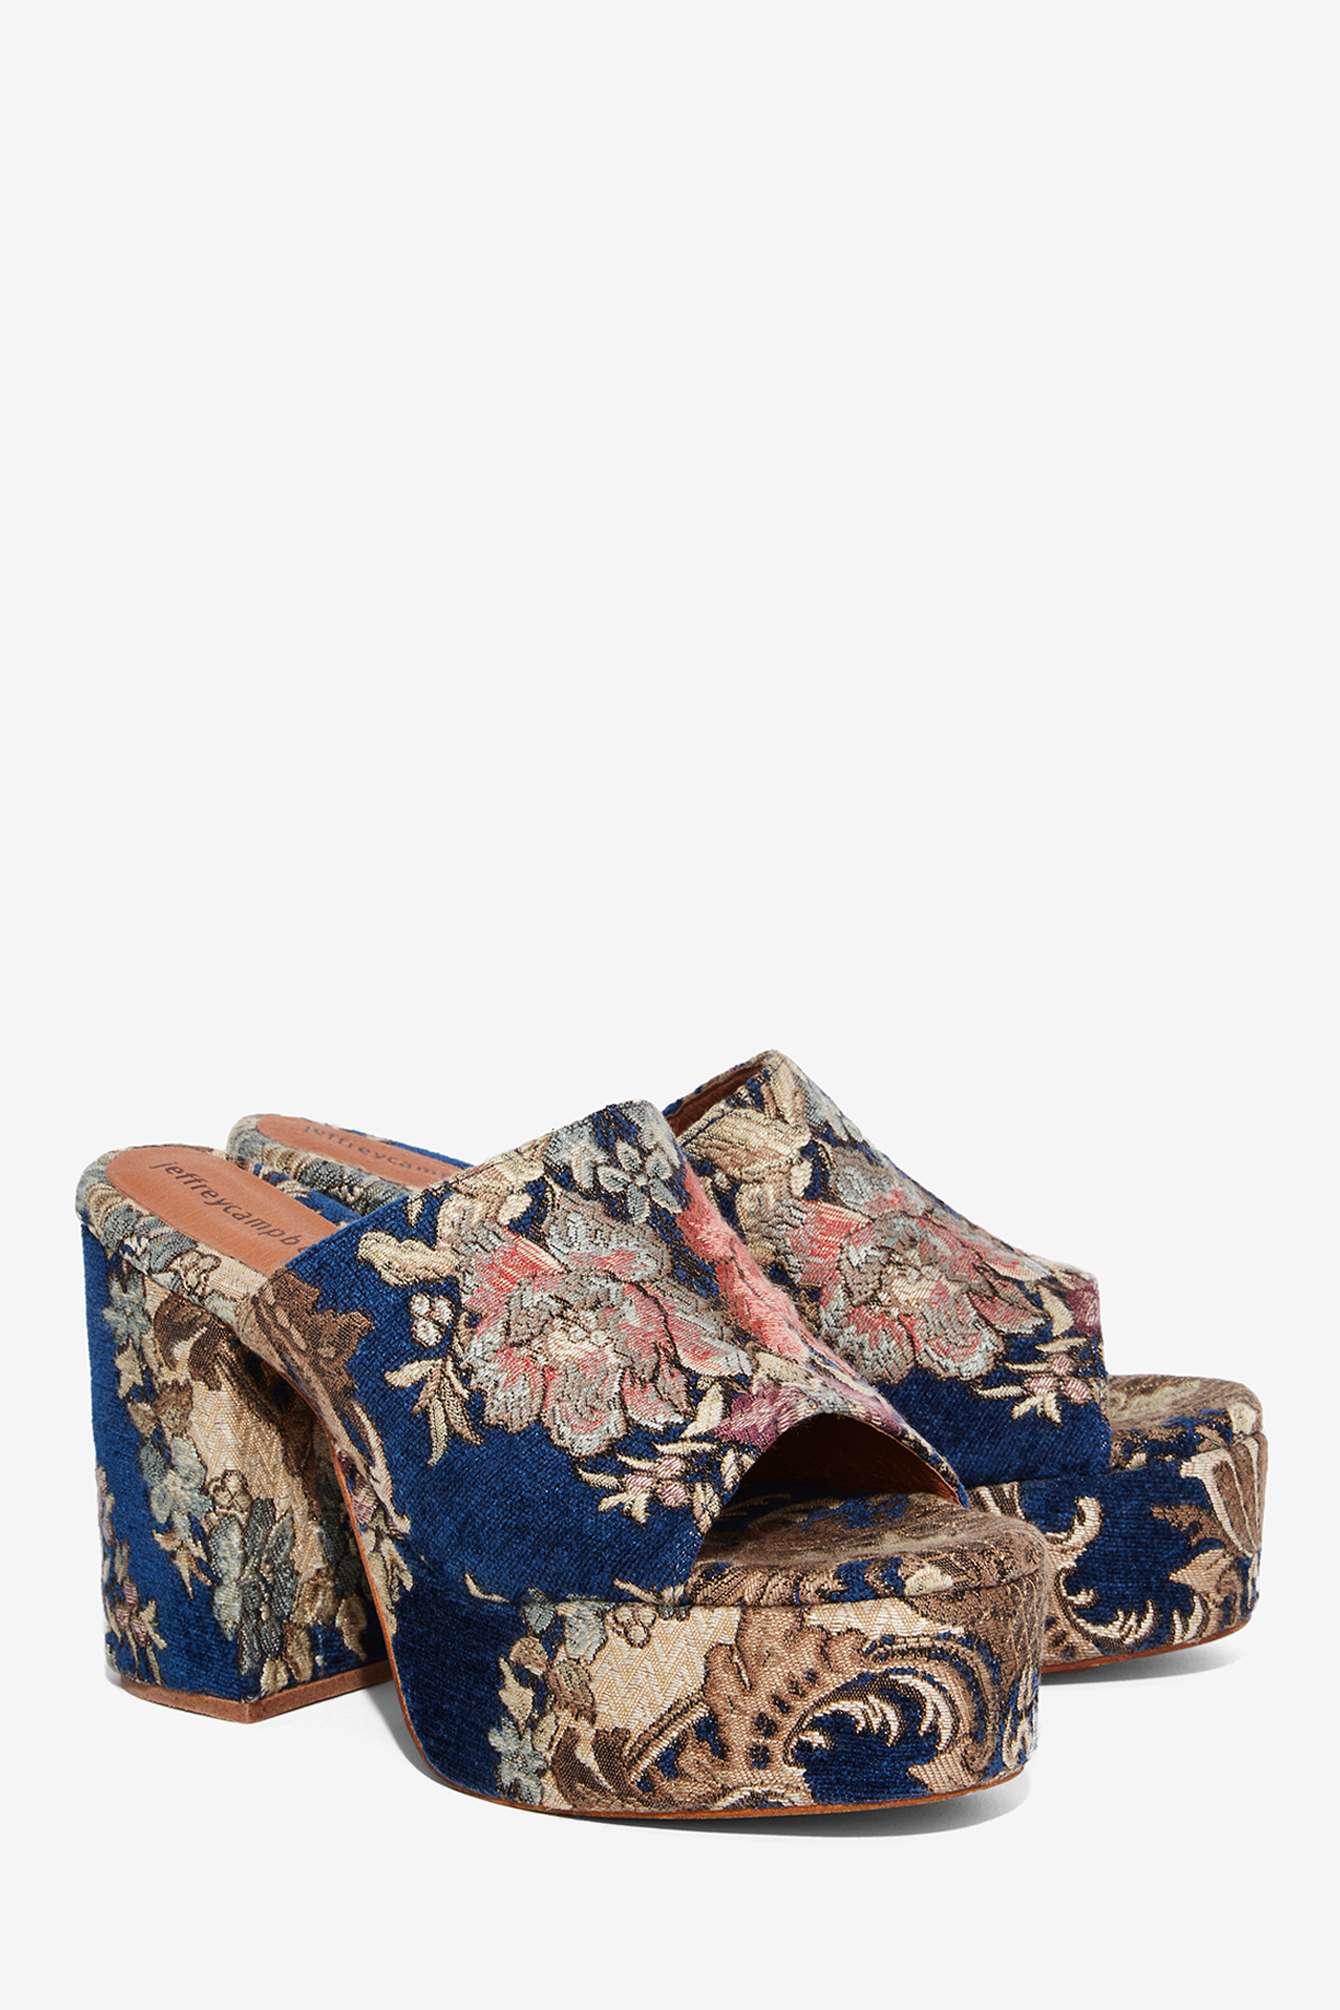 Jeffrey Campbell Pilar Tapestry Mule In Blue Lyst